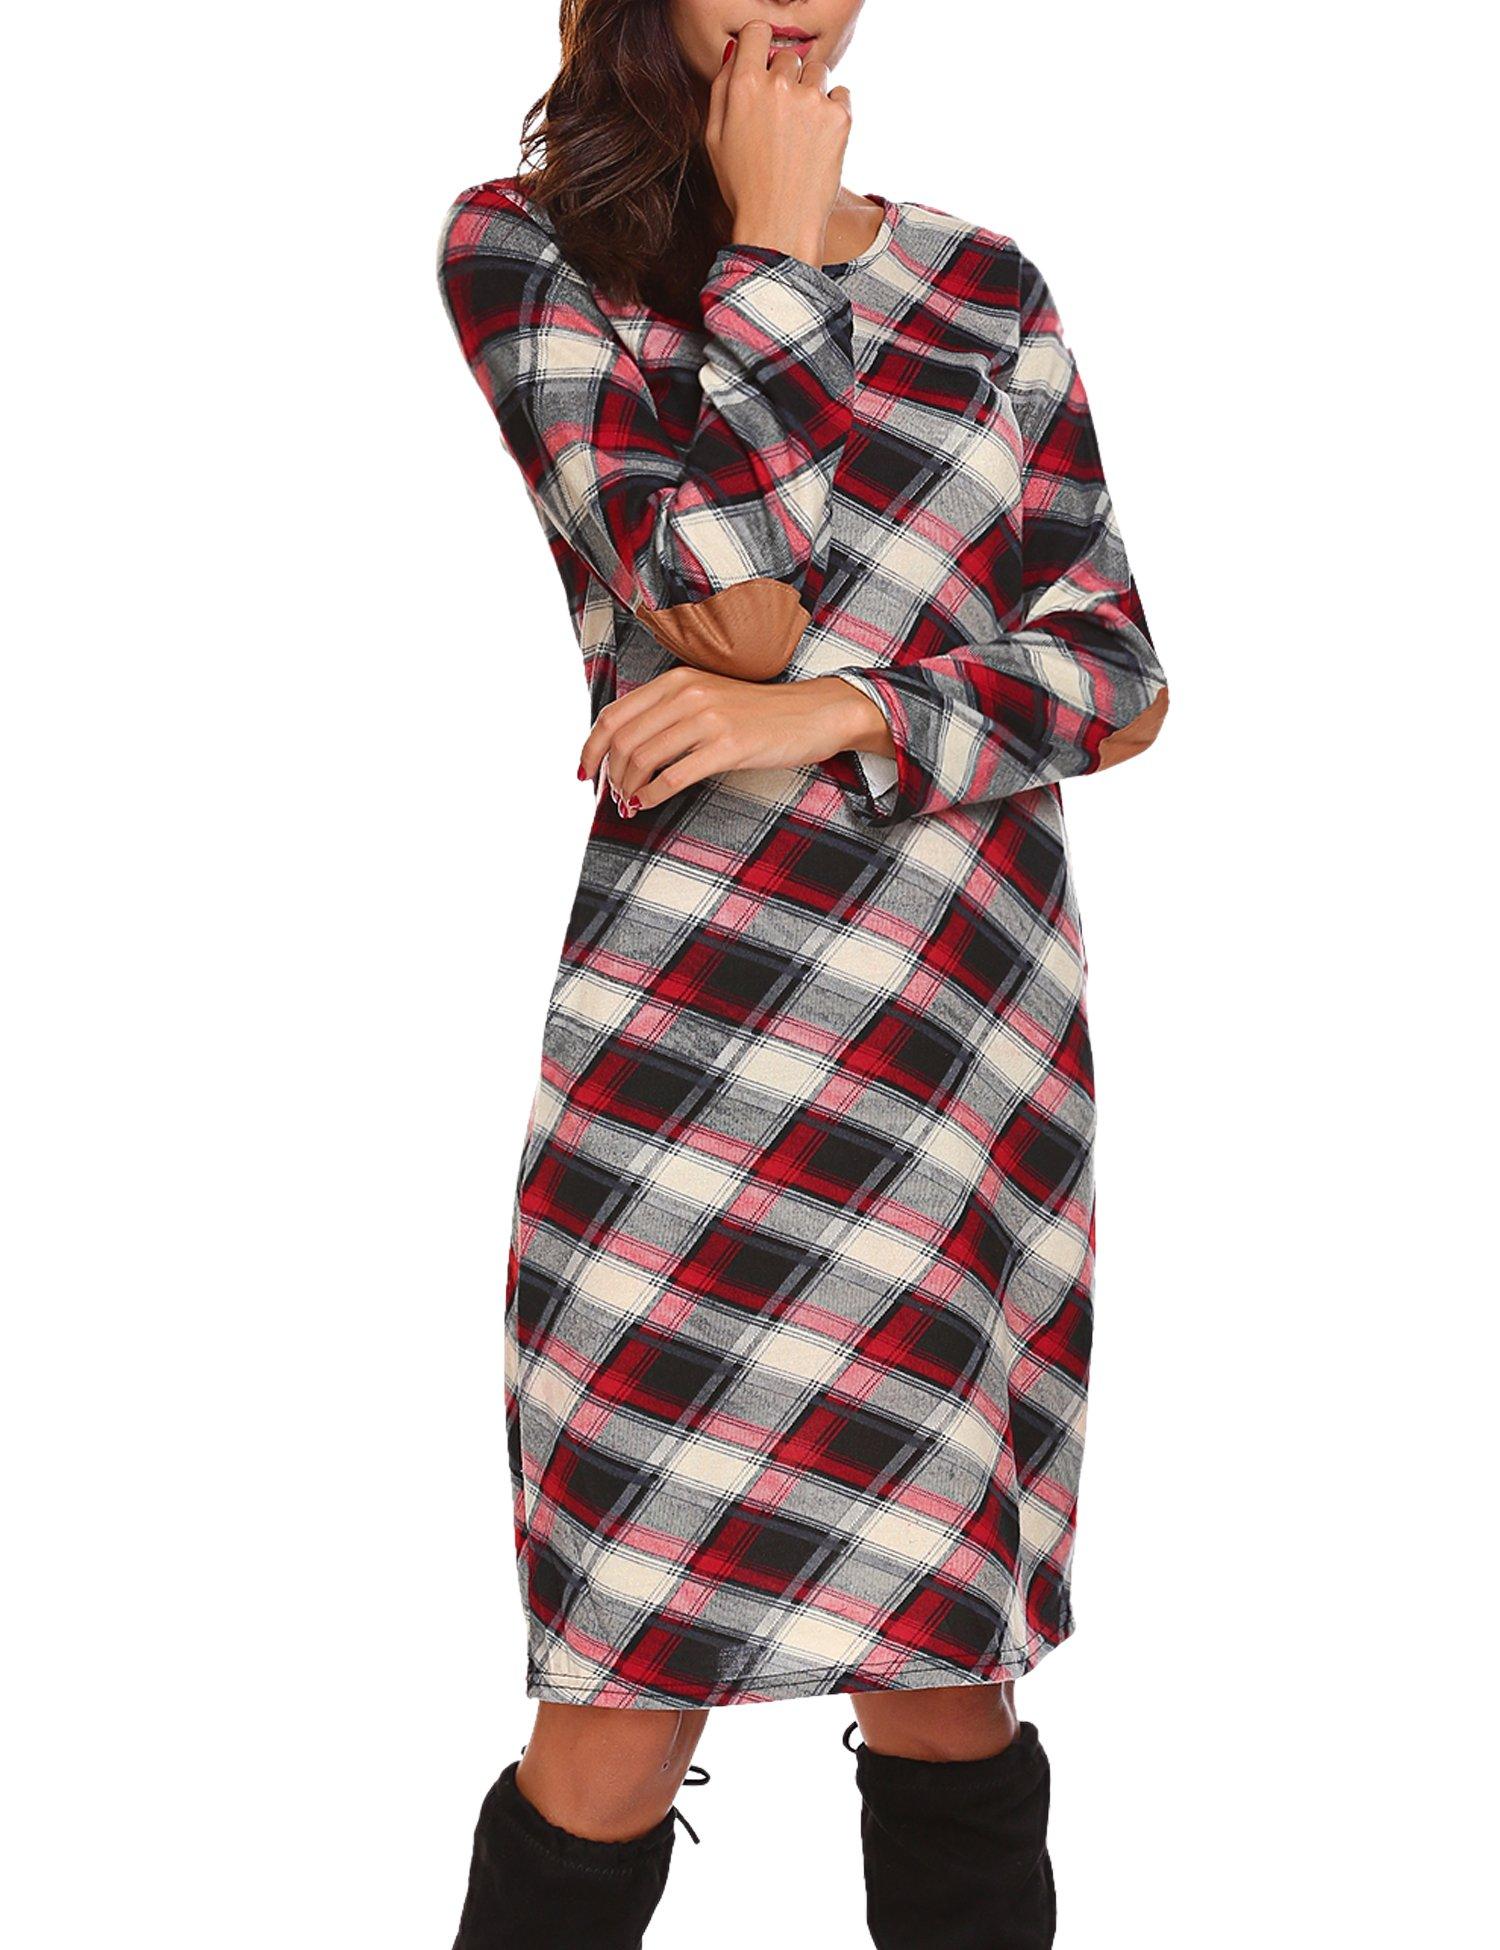 Halife Women's Basic Ethnic Plaid Loose Shirt Tunics Dress Colorfull,XL